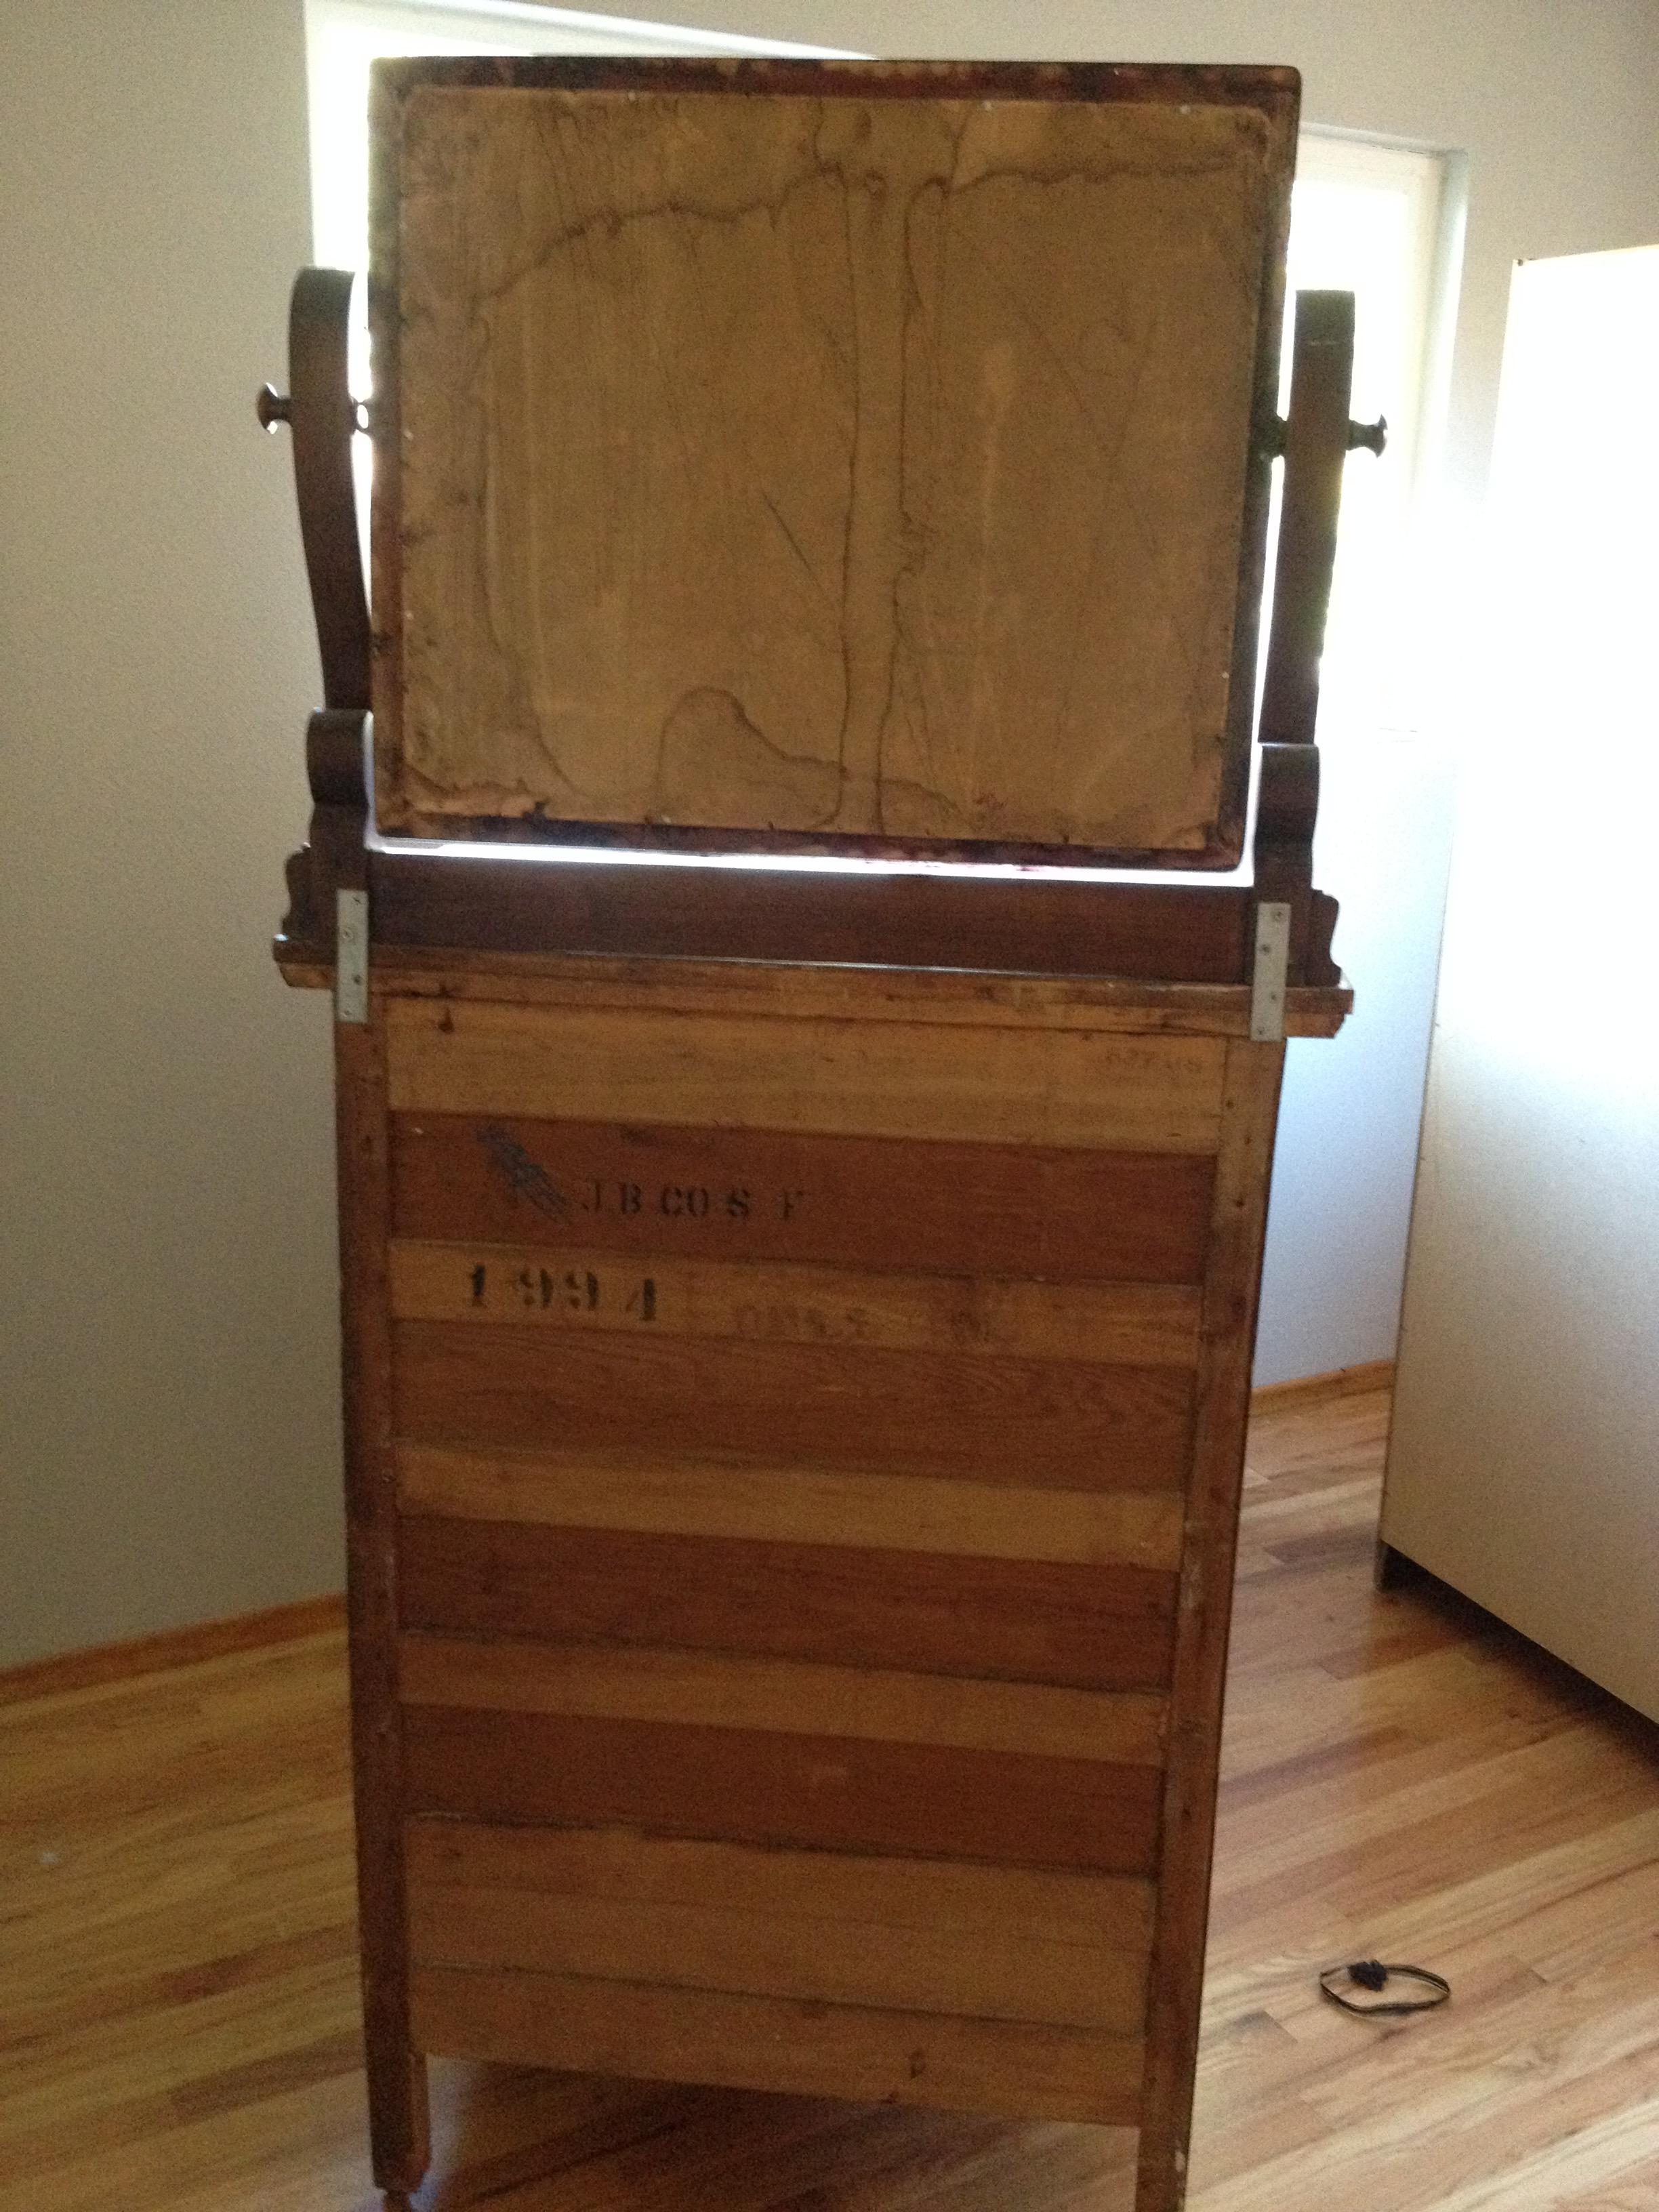 Northern Furniture Company Dresser Sheboygan Wisconsin Antique Appraisal Instappraisal